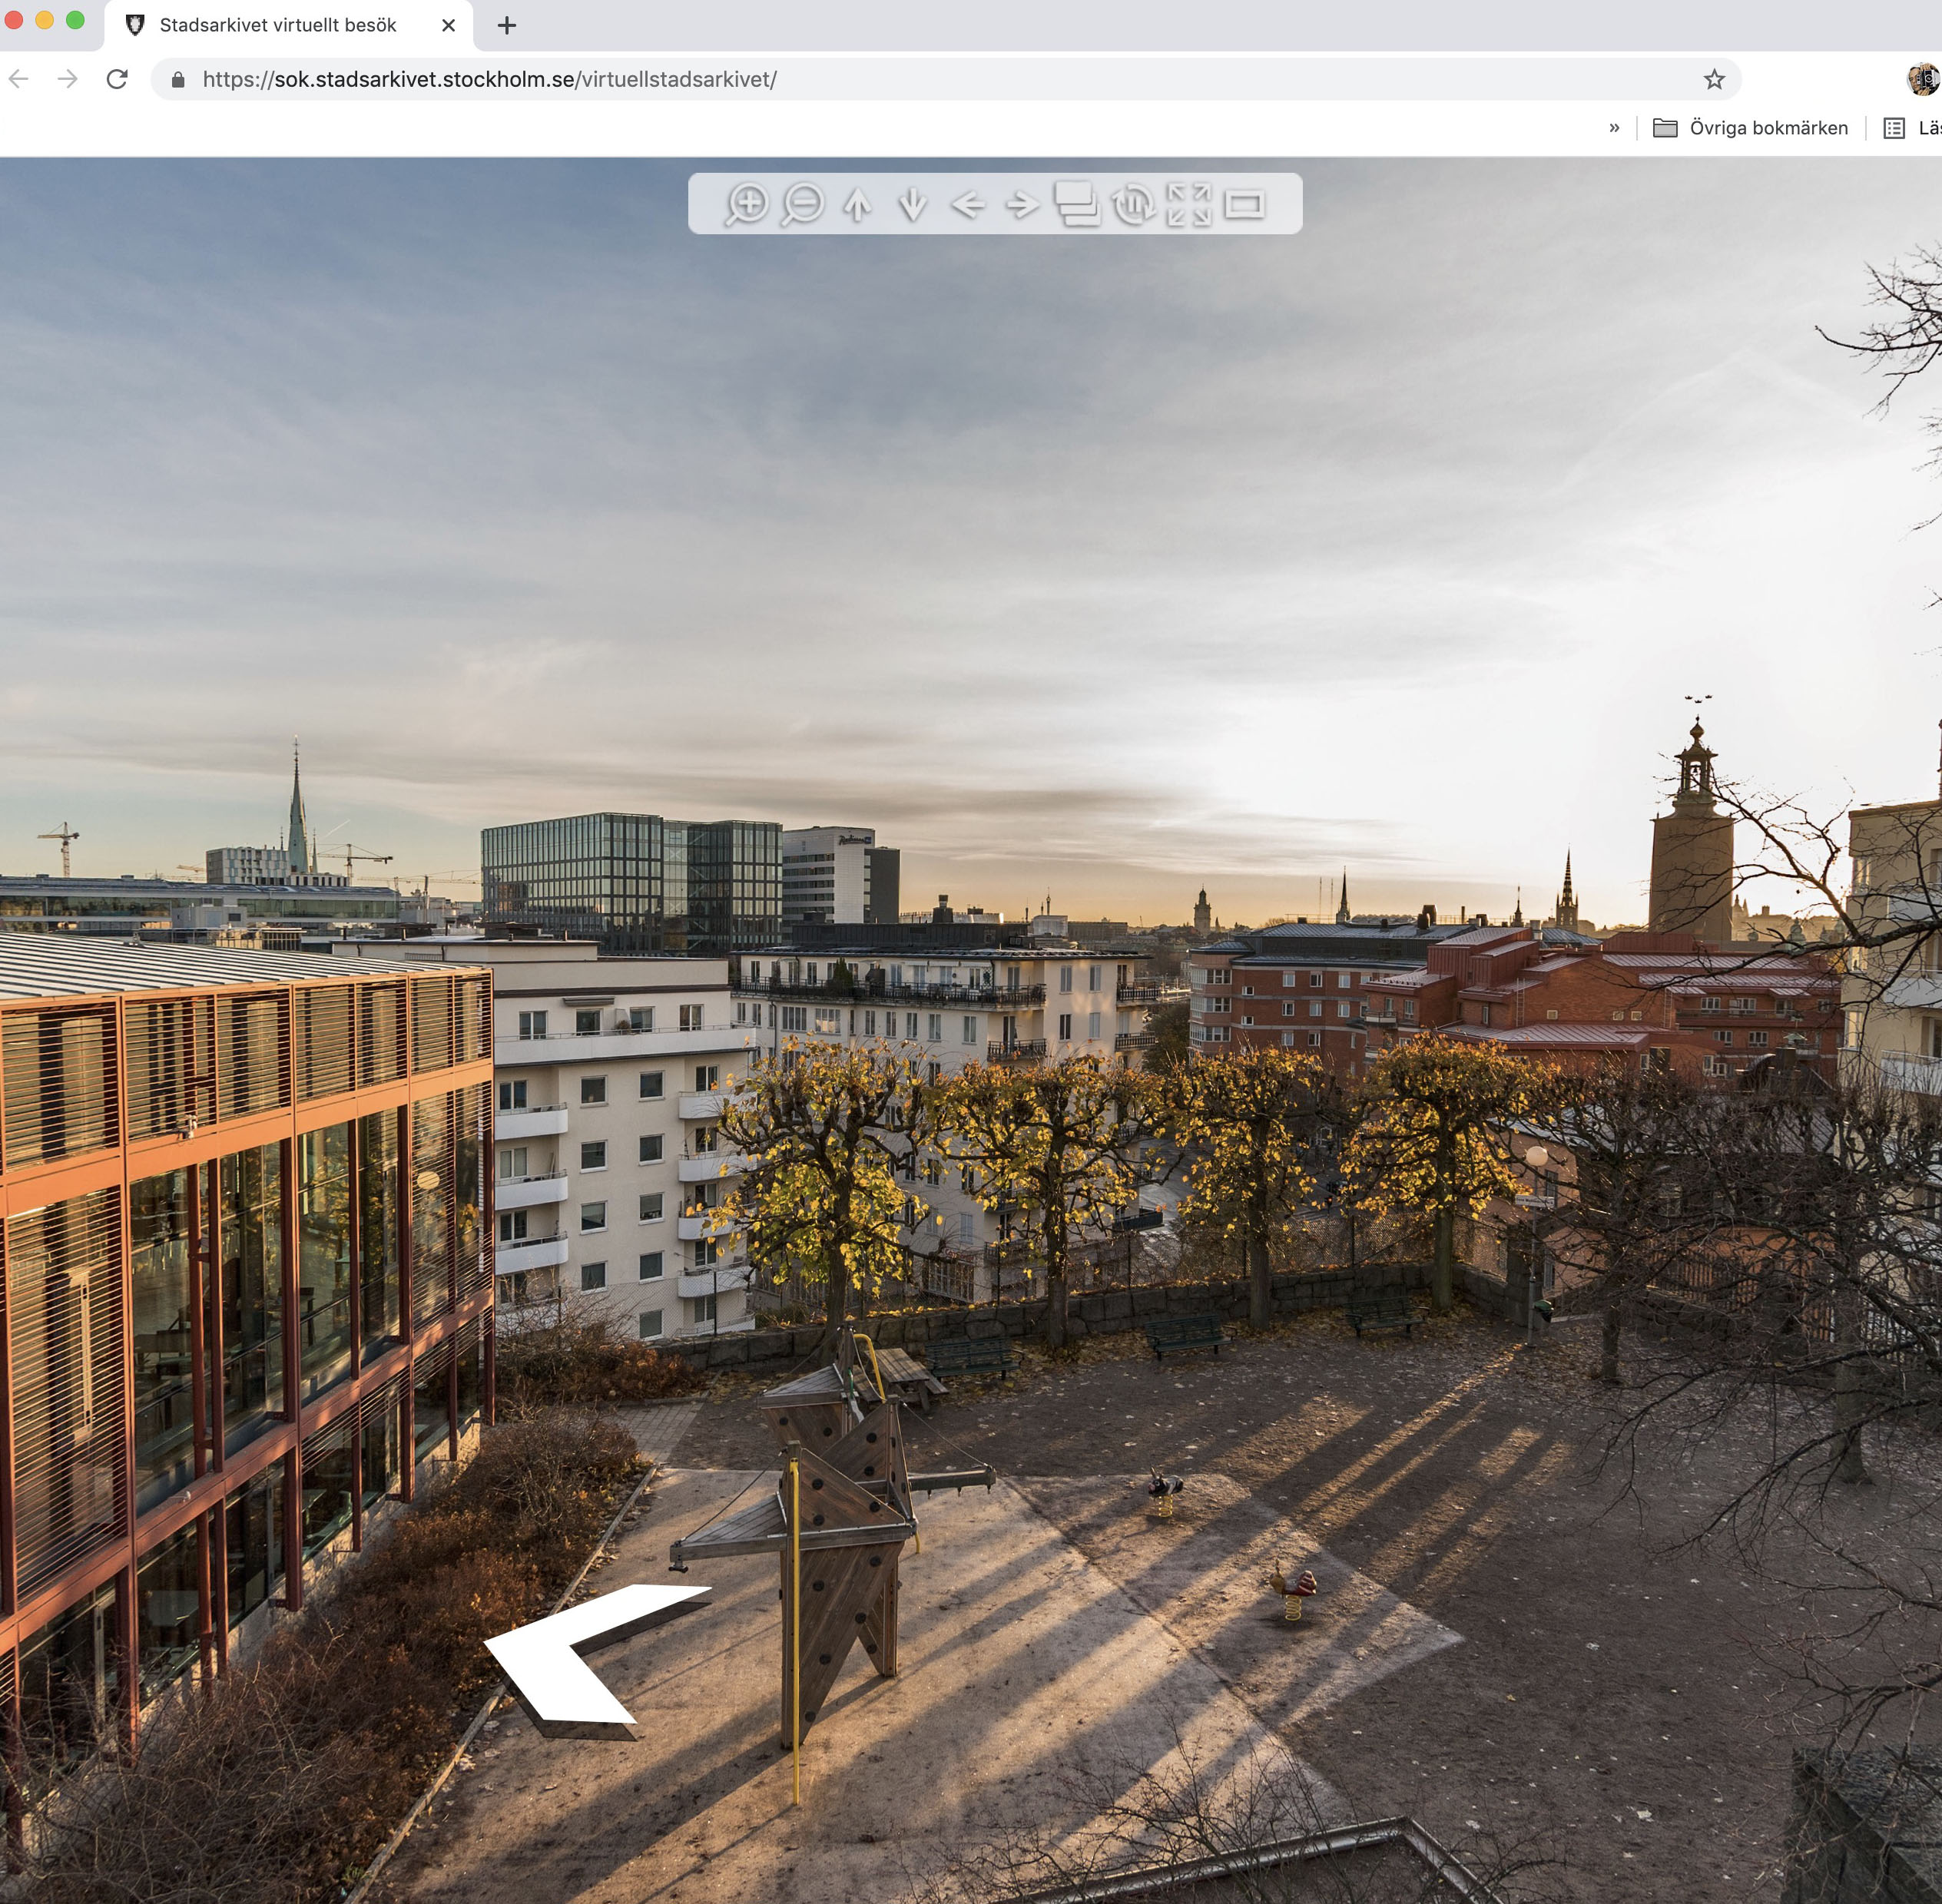 360 panorama foton på egen server